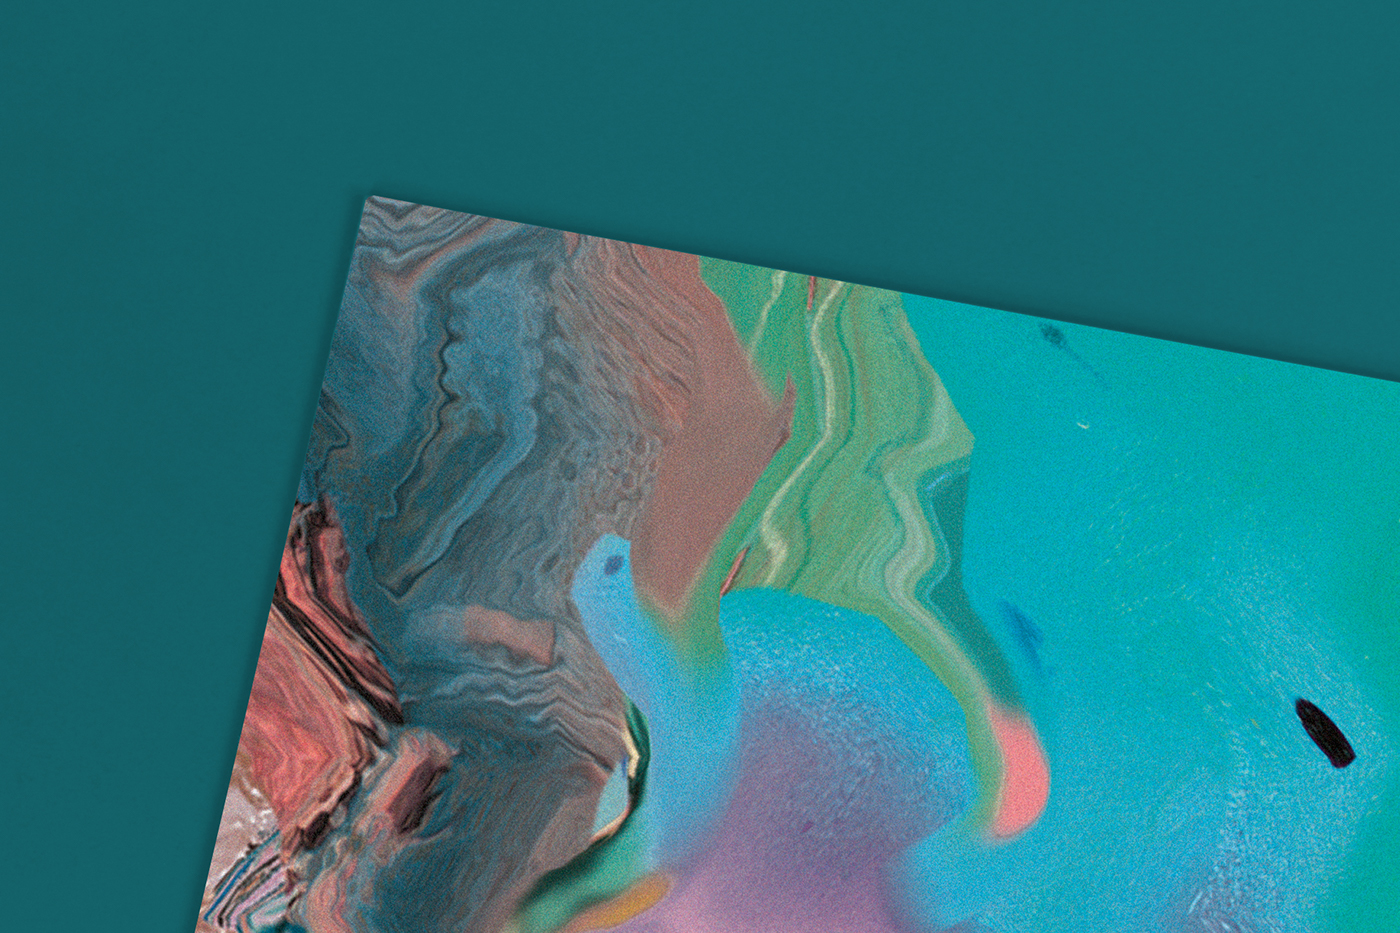 Album cover artwork music vinyl albumcover ep distort Glitch cd